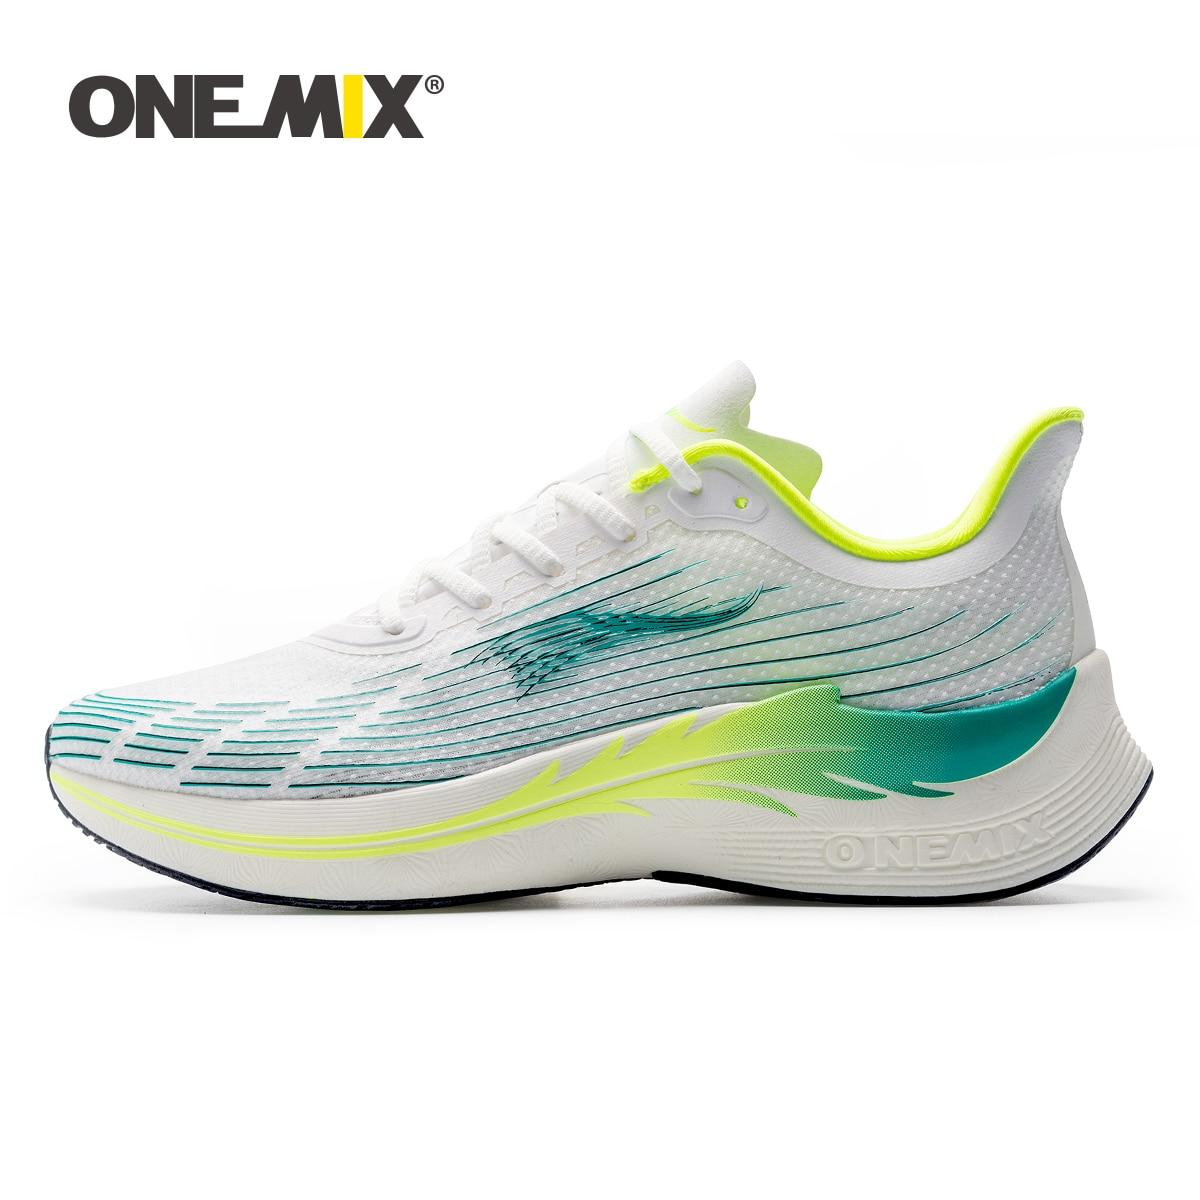 ONEMIX 2021 حذاء رياضي الرجال تنفس لوحة احذية الجري البرية عادية لينة الاتجاه الجديد أحذية مشي للذكور في الهواء الطلق أحذية رياضية